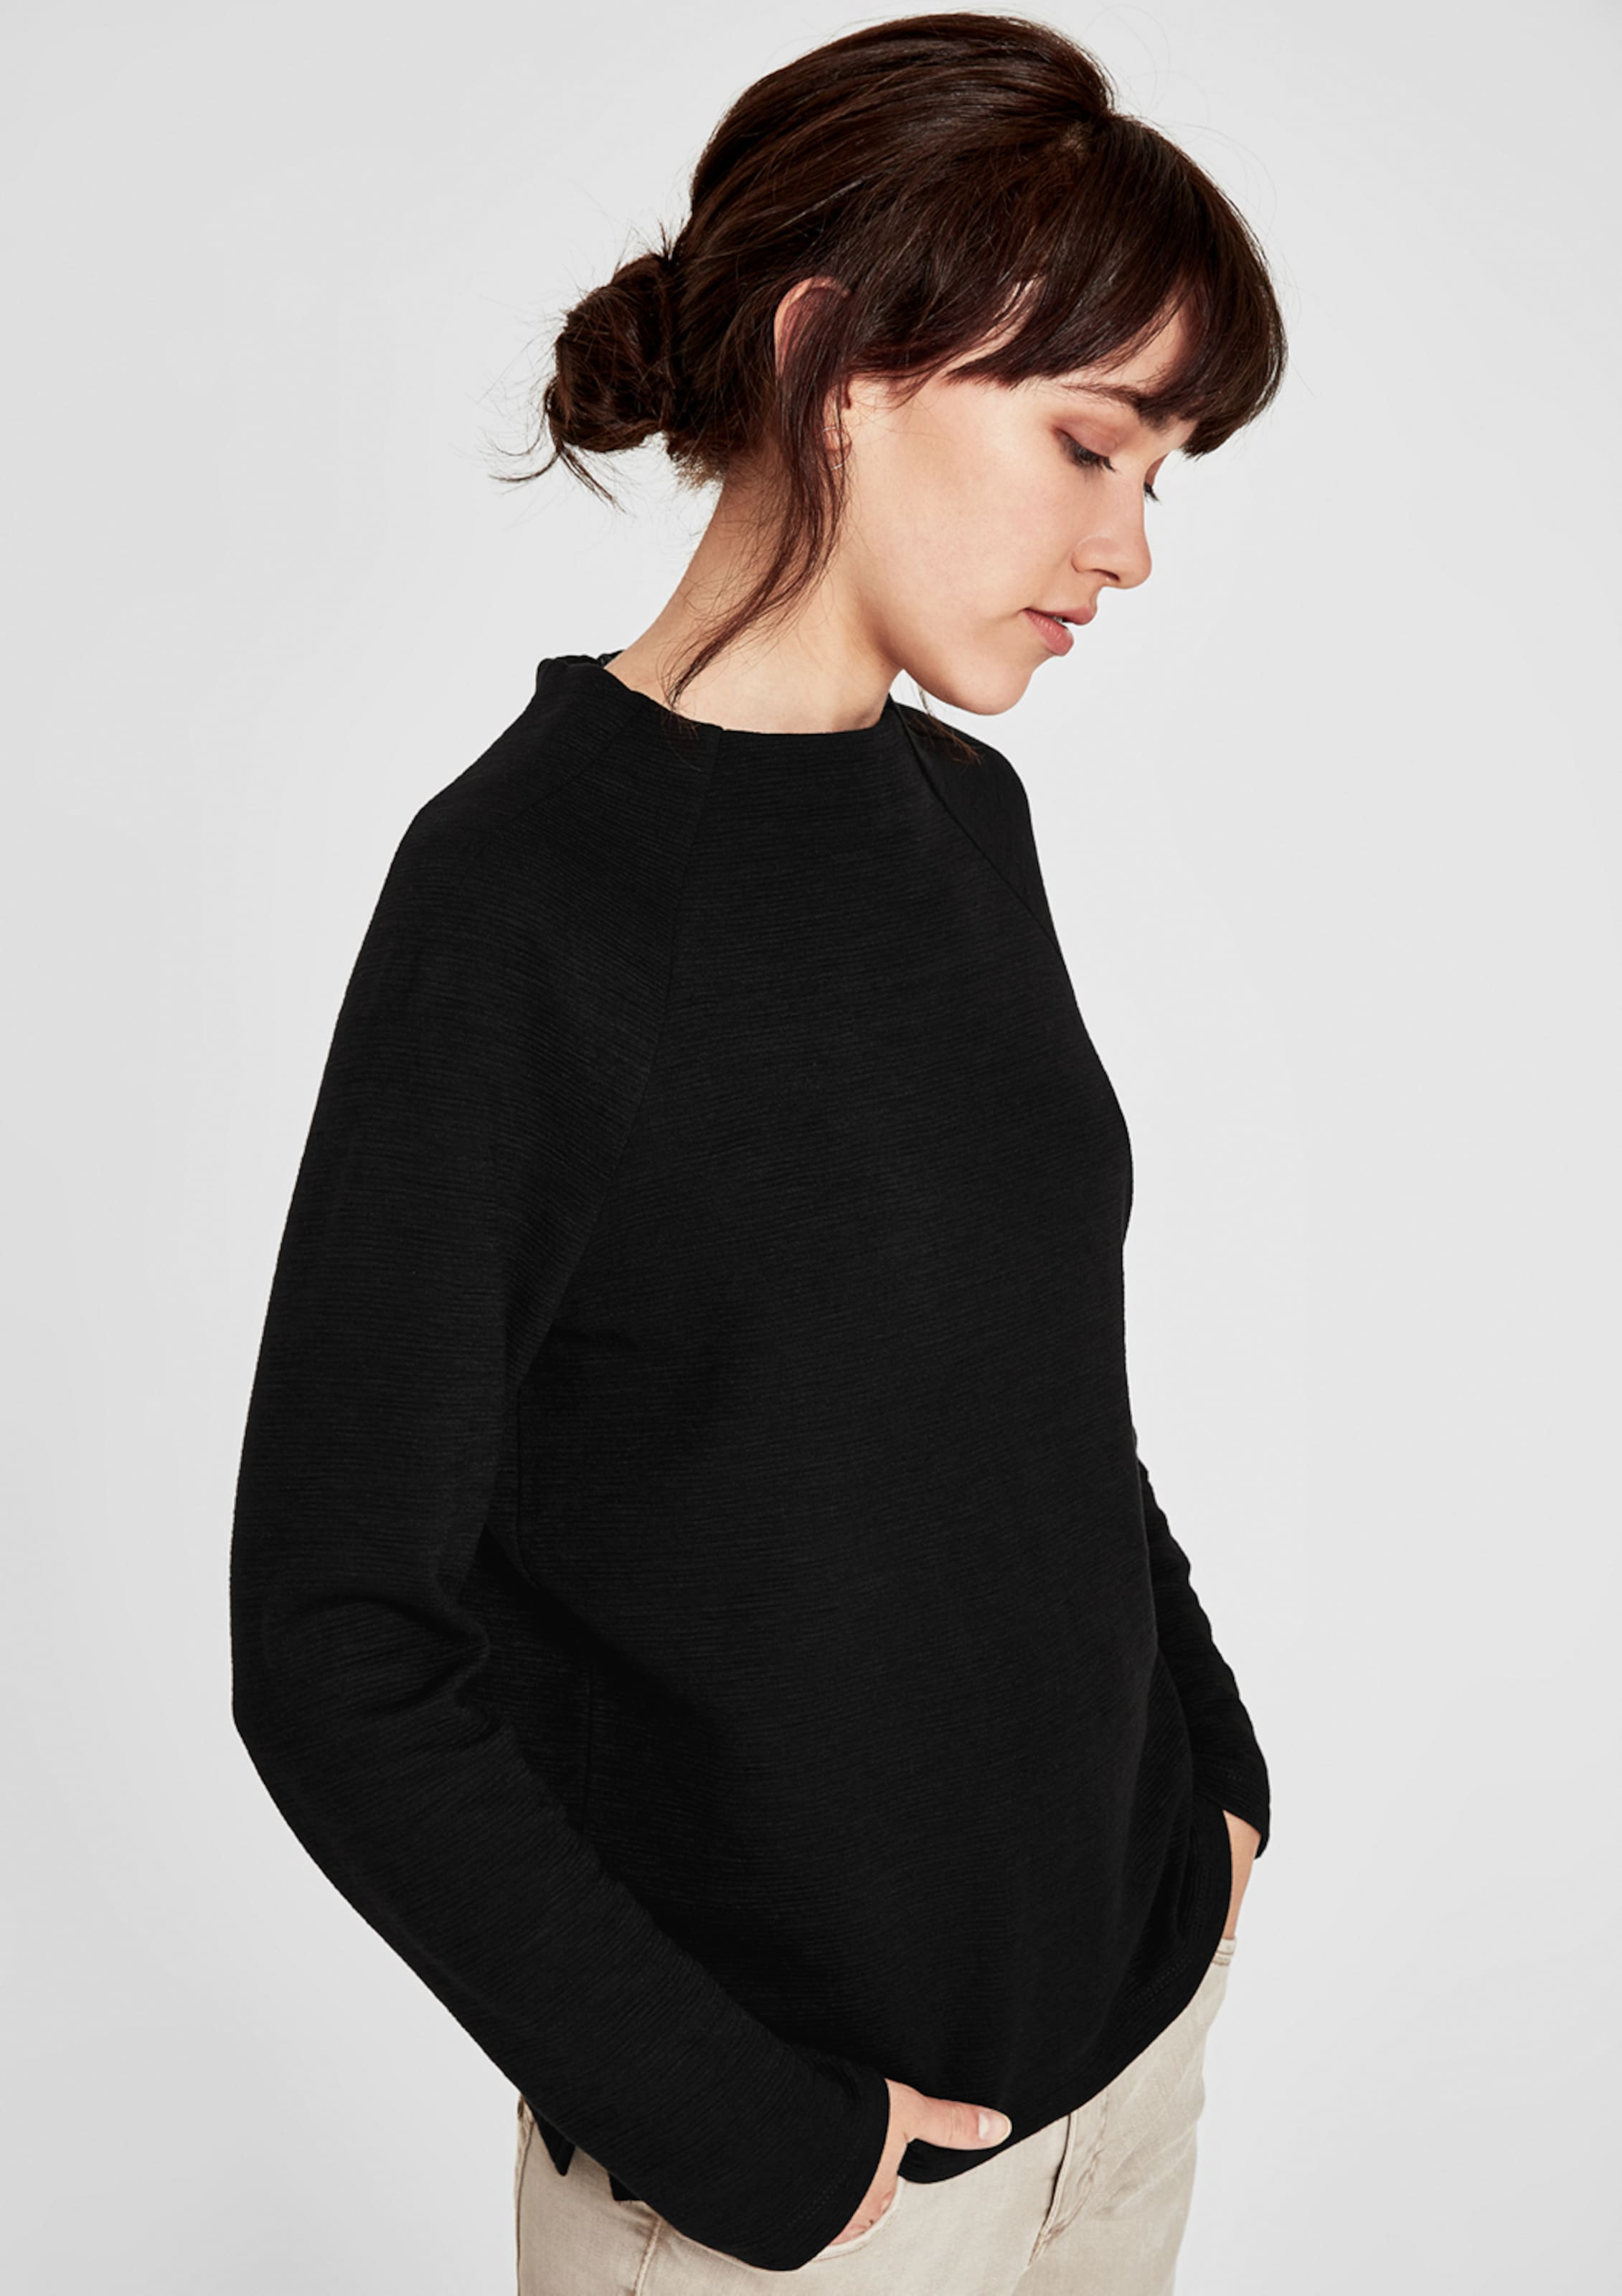 Sweatshirt In Schwarz S oliver oliver S Sweatshirt hdtrQCs